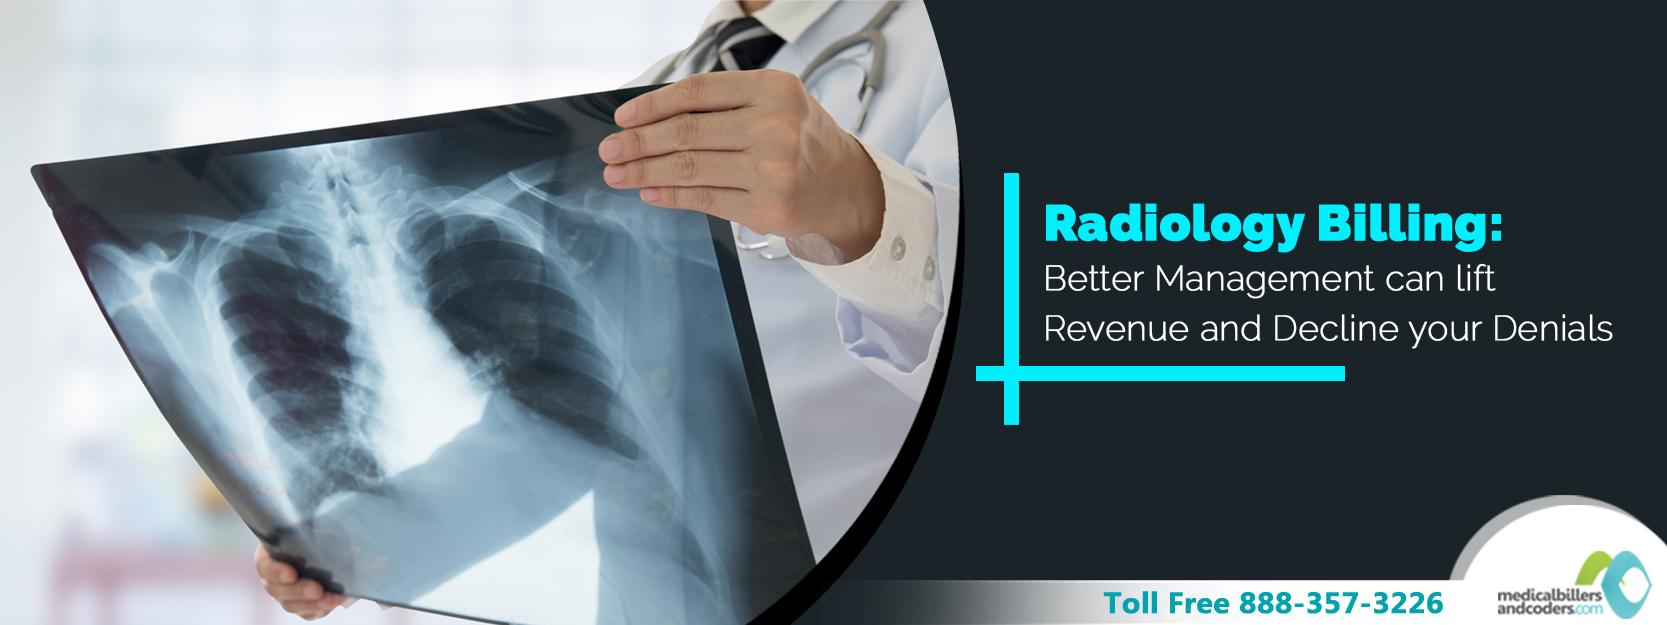 Radiology Billing: Better Management Can Lift Revenue and Decline Your Denials